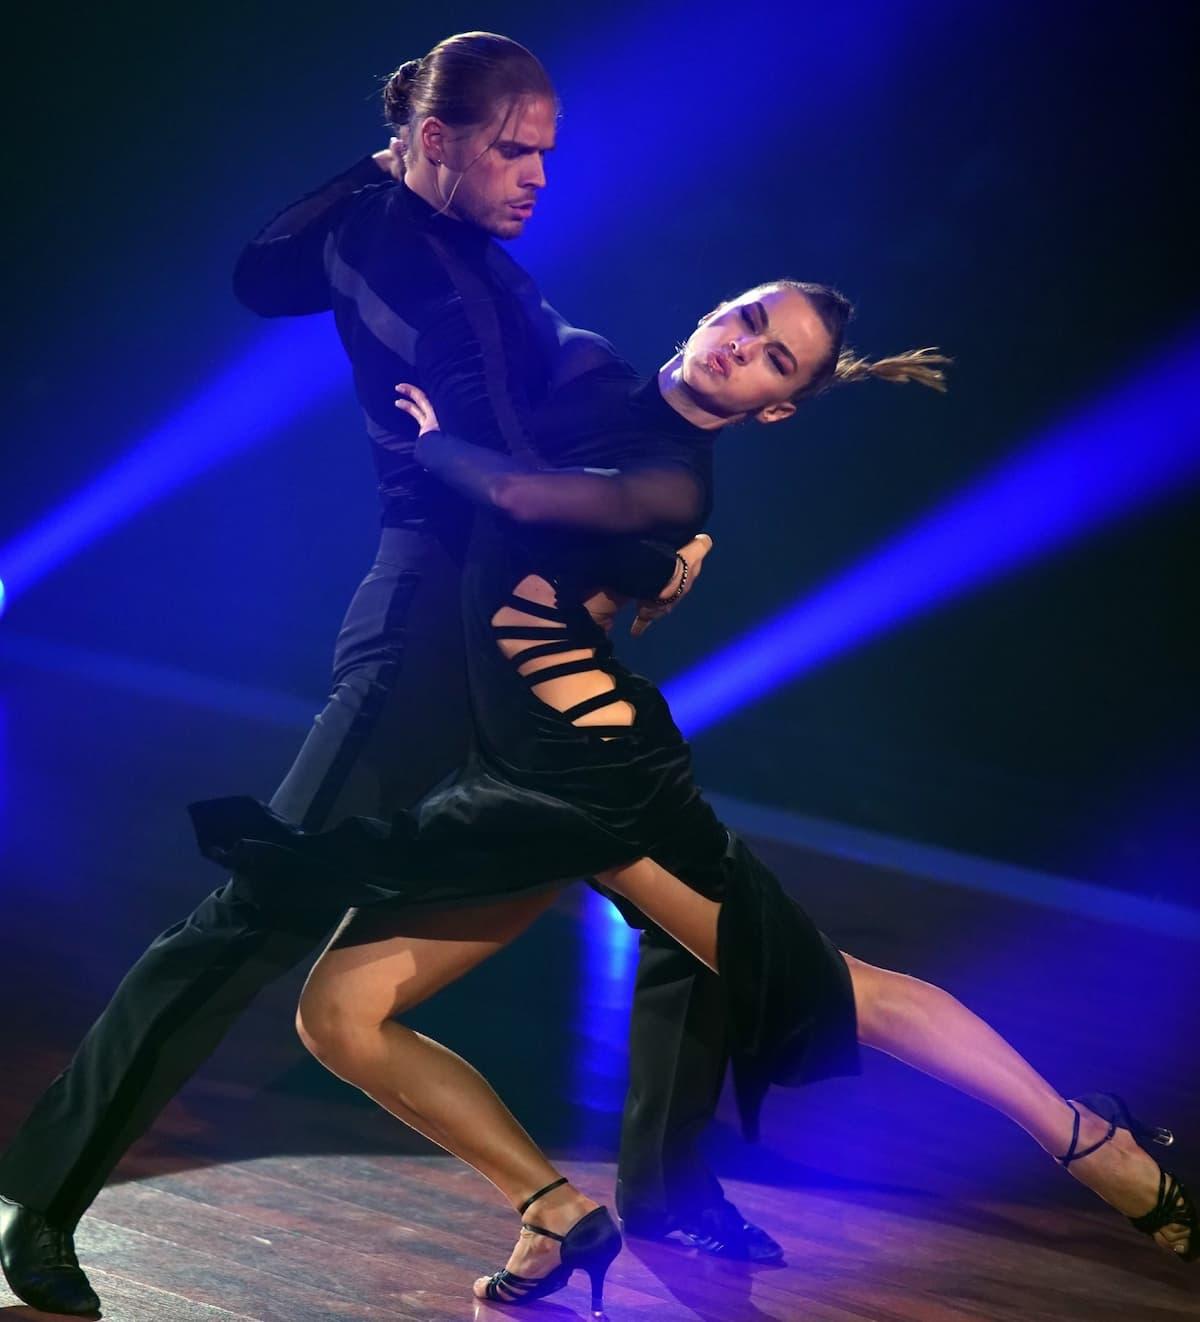 Rurik Gislason - Renata Lusin bei Let's dance am 26.3.2021